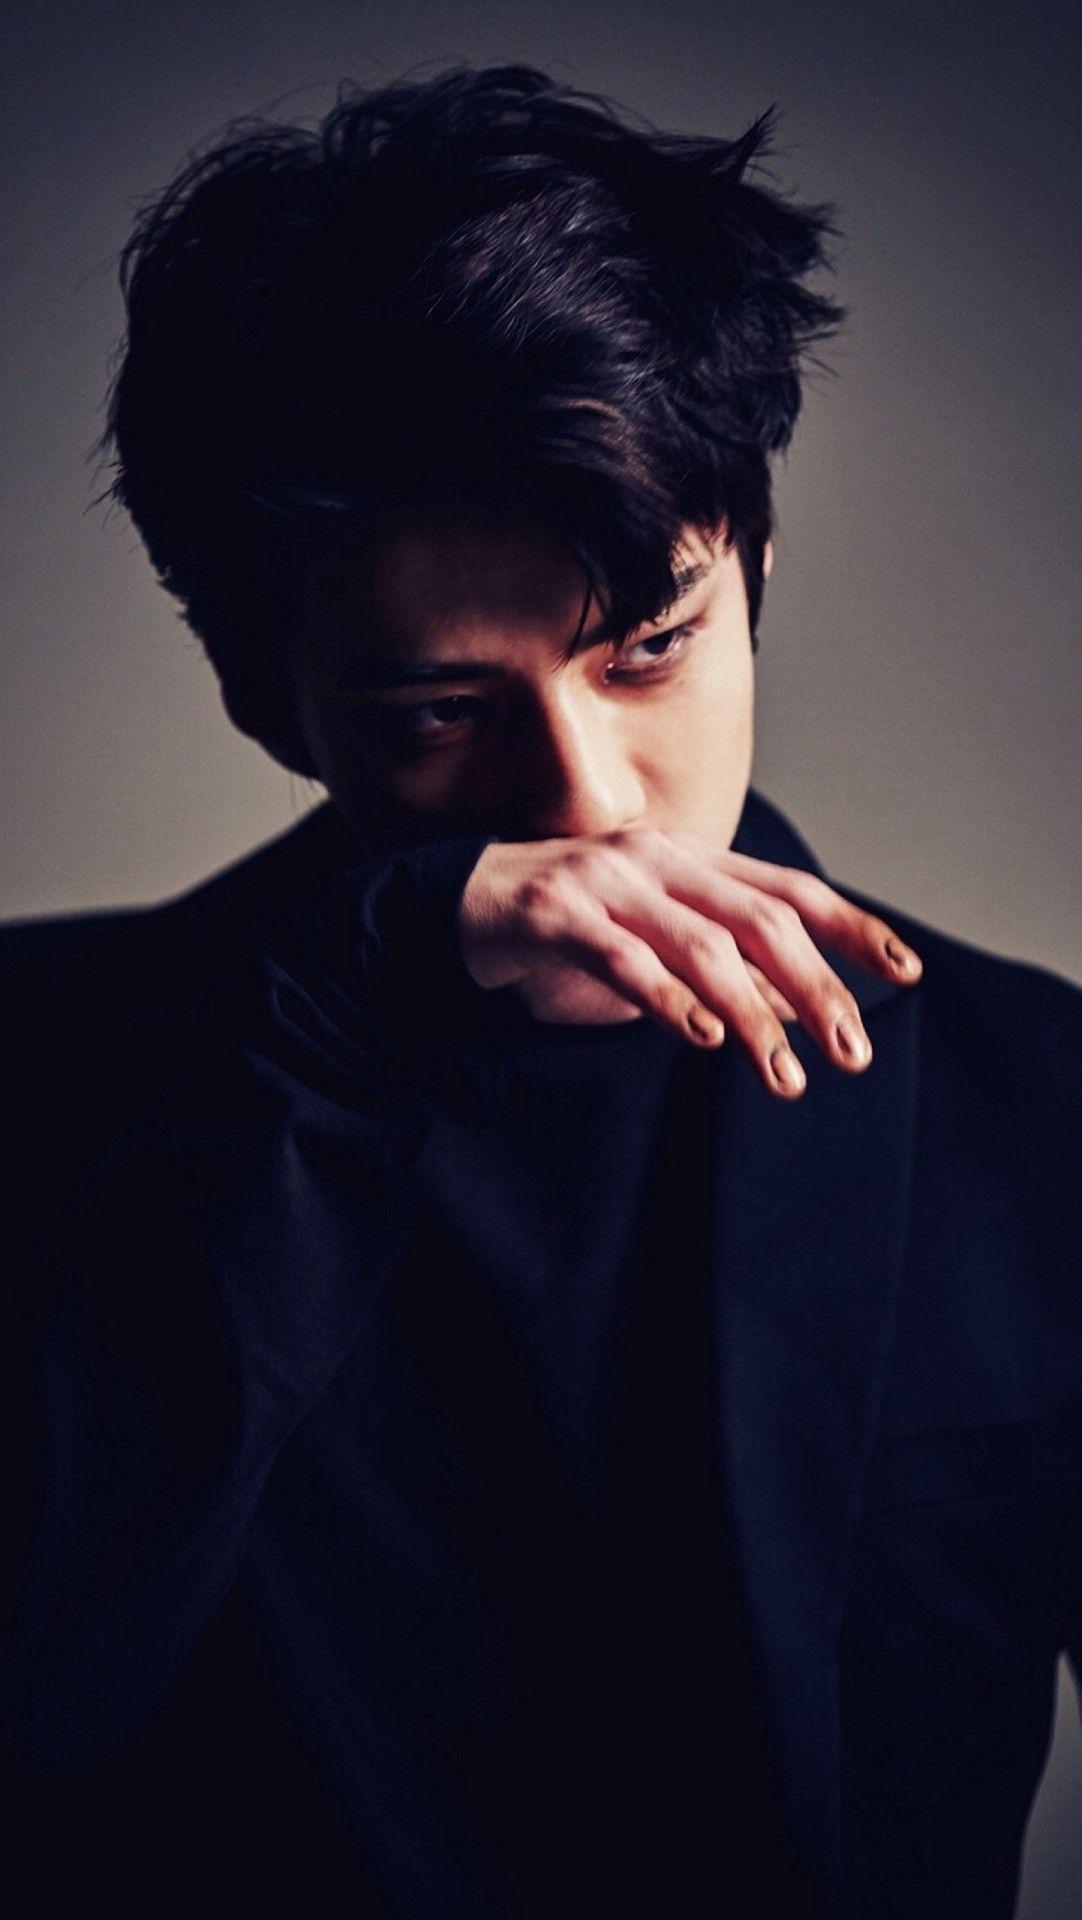 Kpop Exo Phone Wallpaper Exo Wallpaper Exo Background - Oh Sehun , HD Wallpaper & Backgrounds